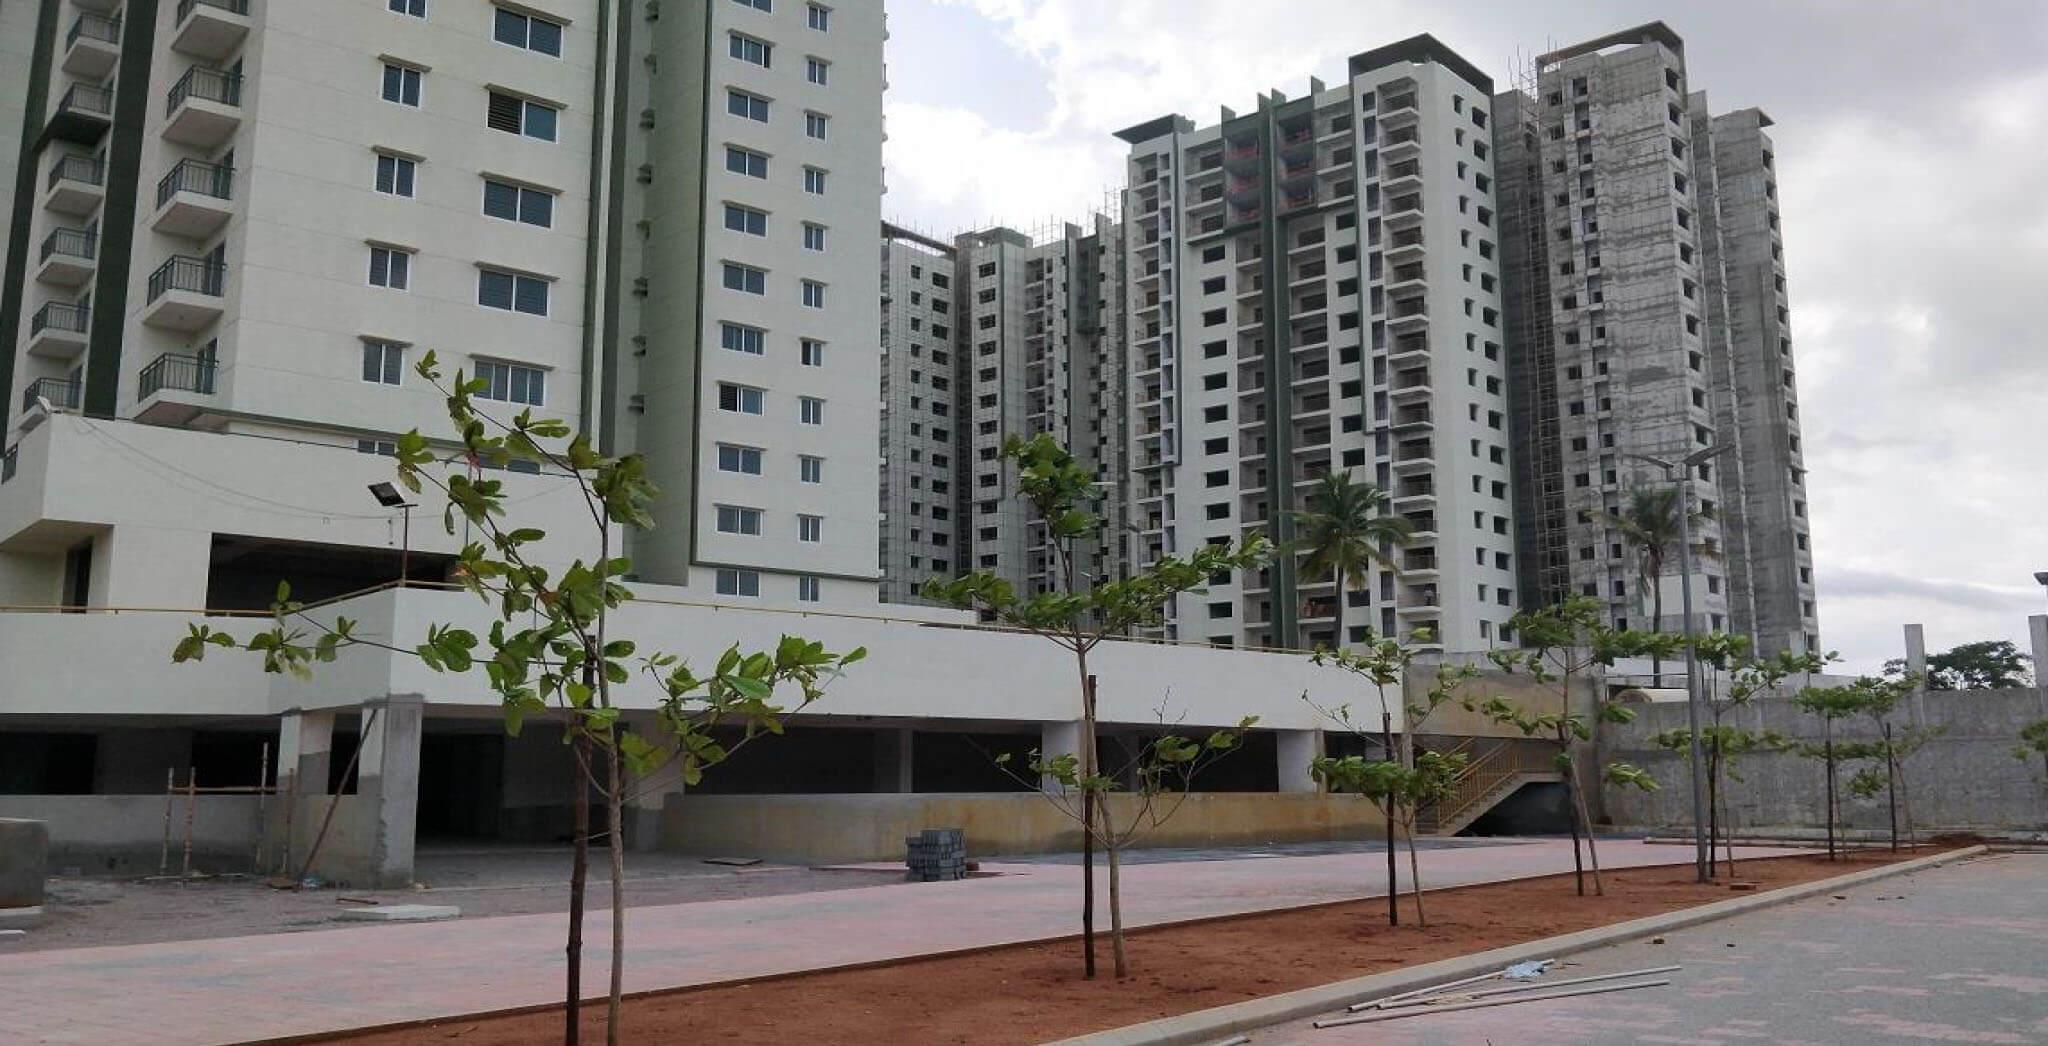 Jun 2018 - Tower D and Visitor car park area plantation